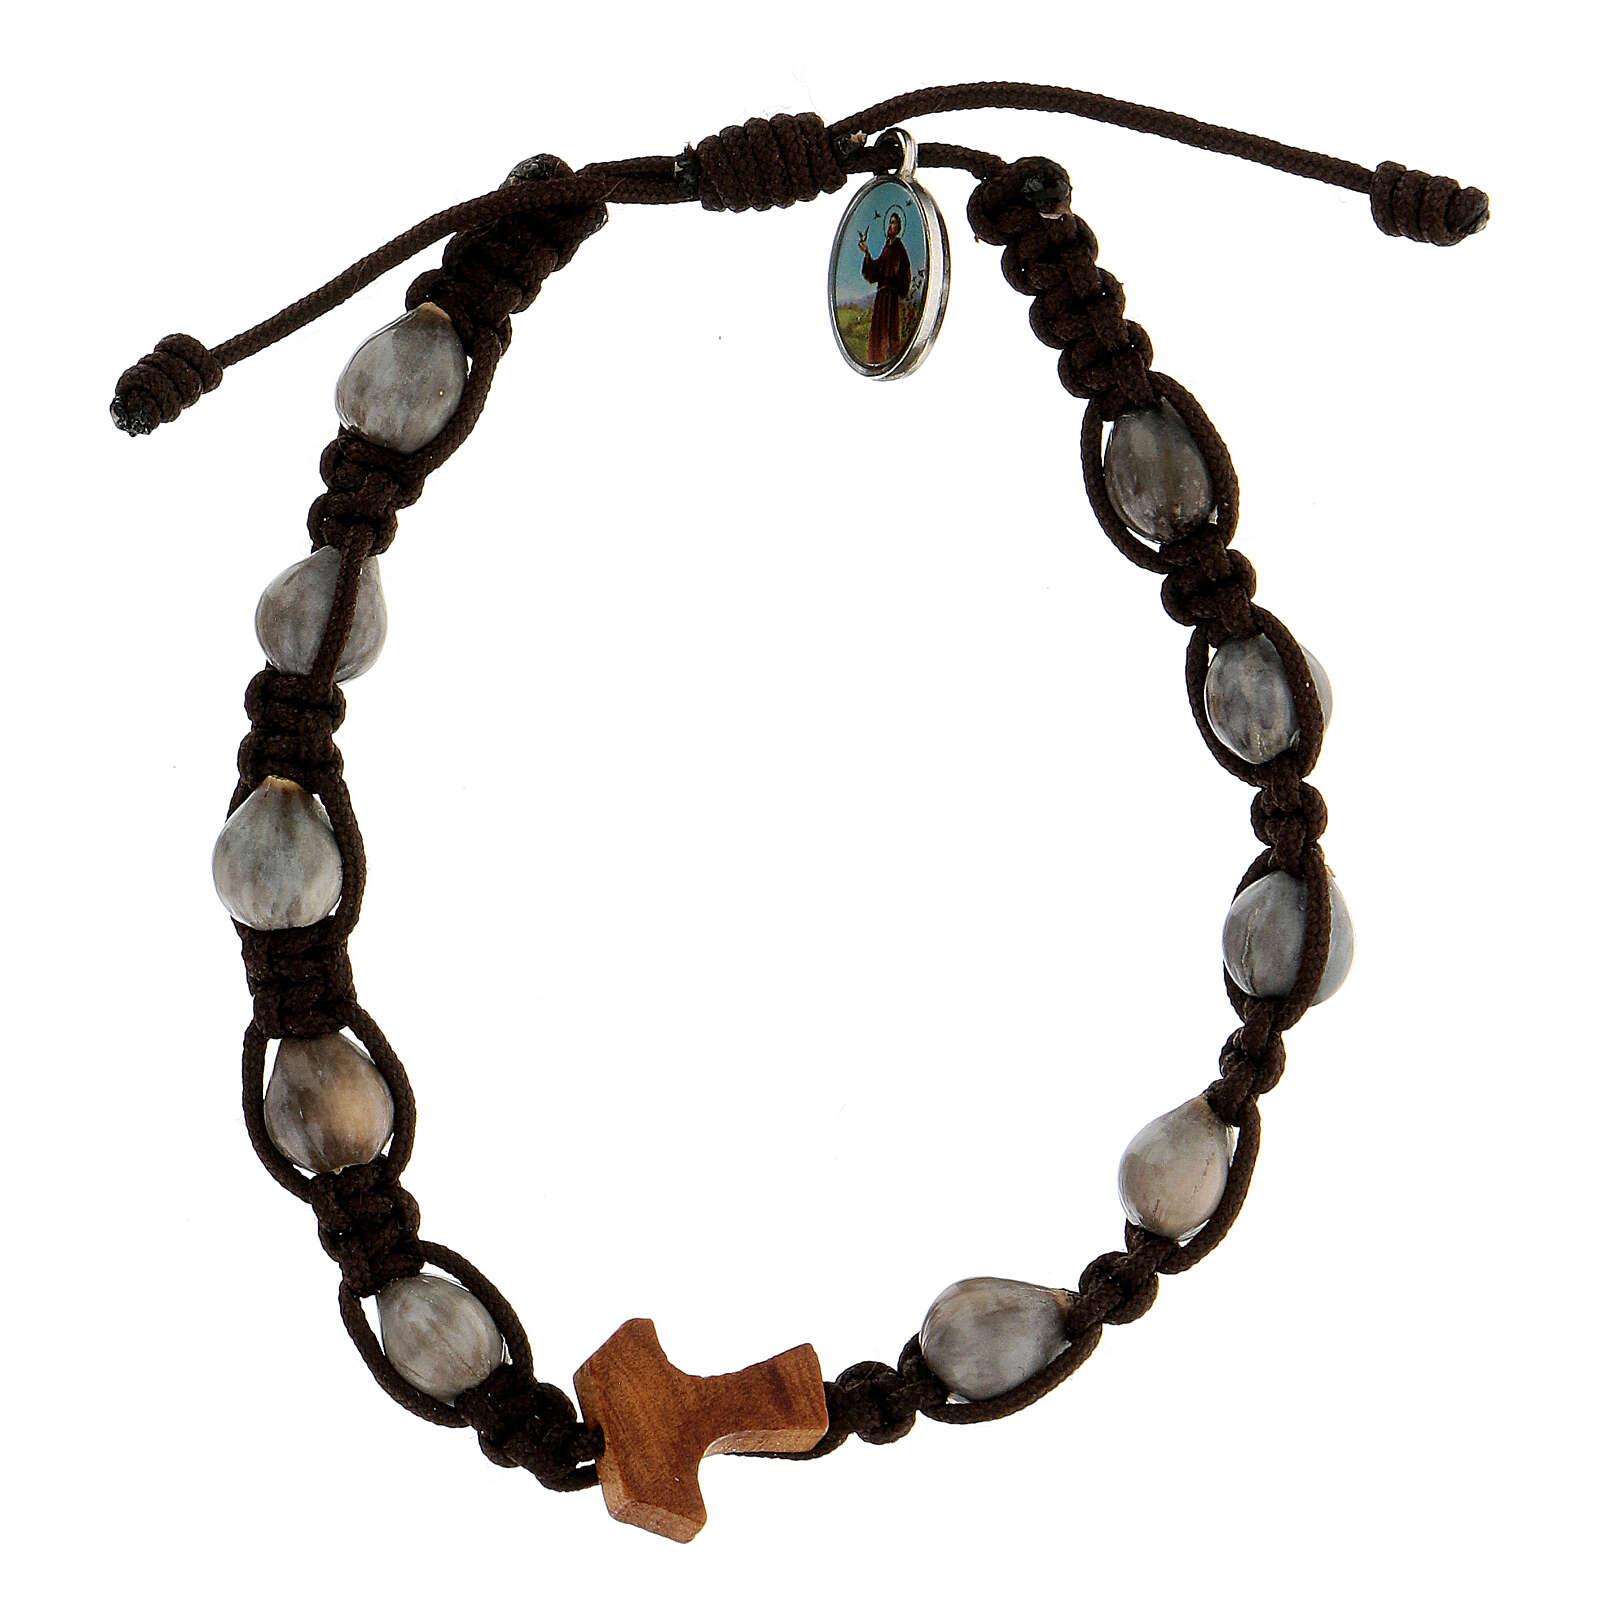 Handmade bracelet made in Medjugorje, Job's Tear, brown rope and religious medal 4